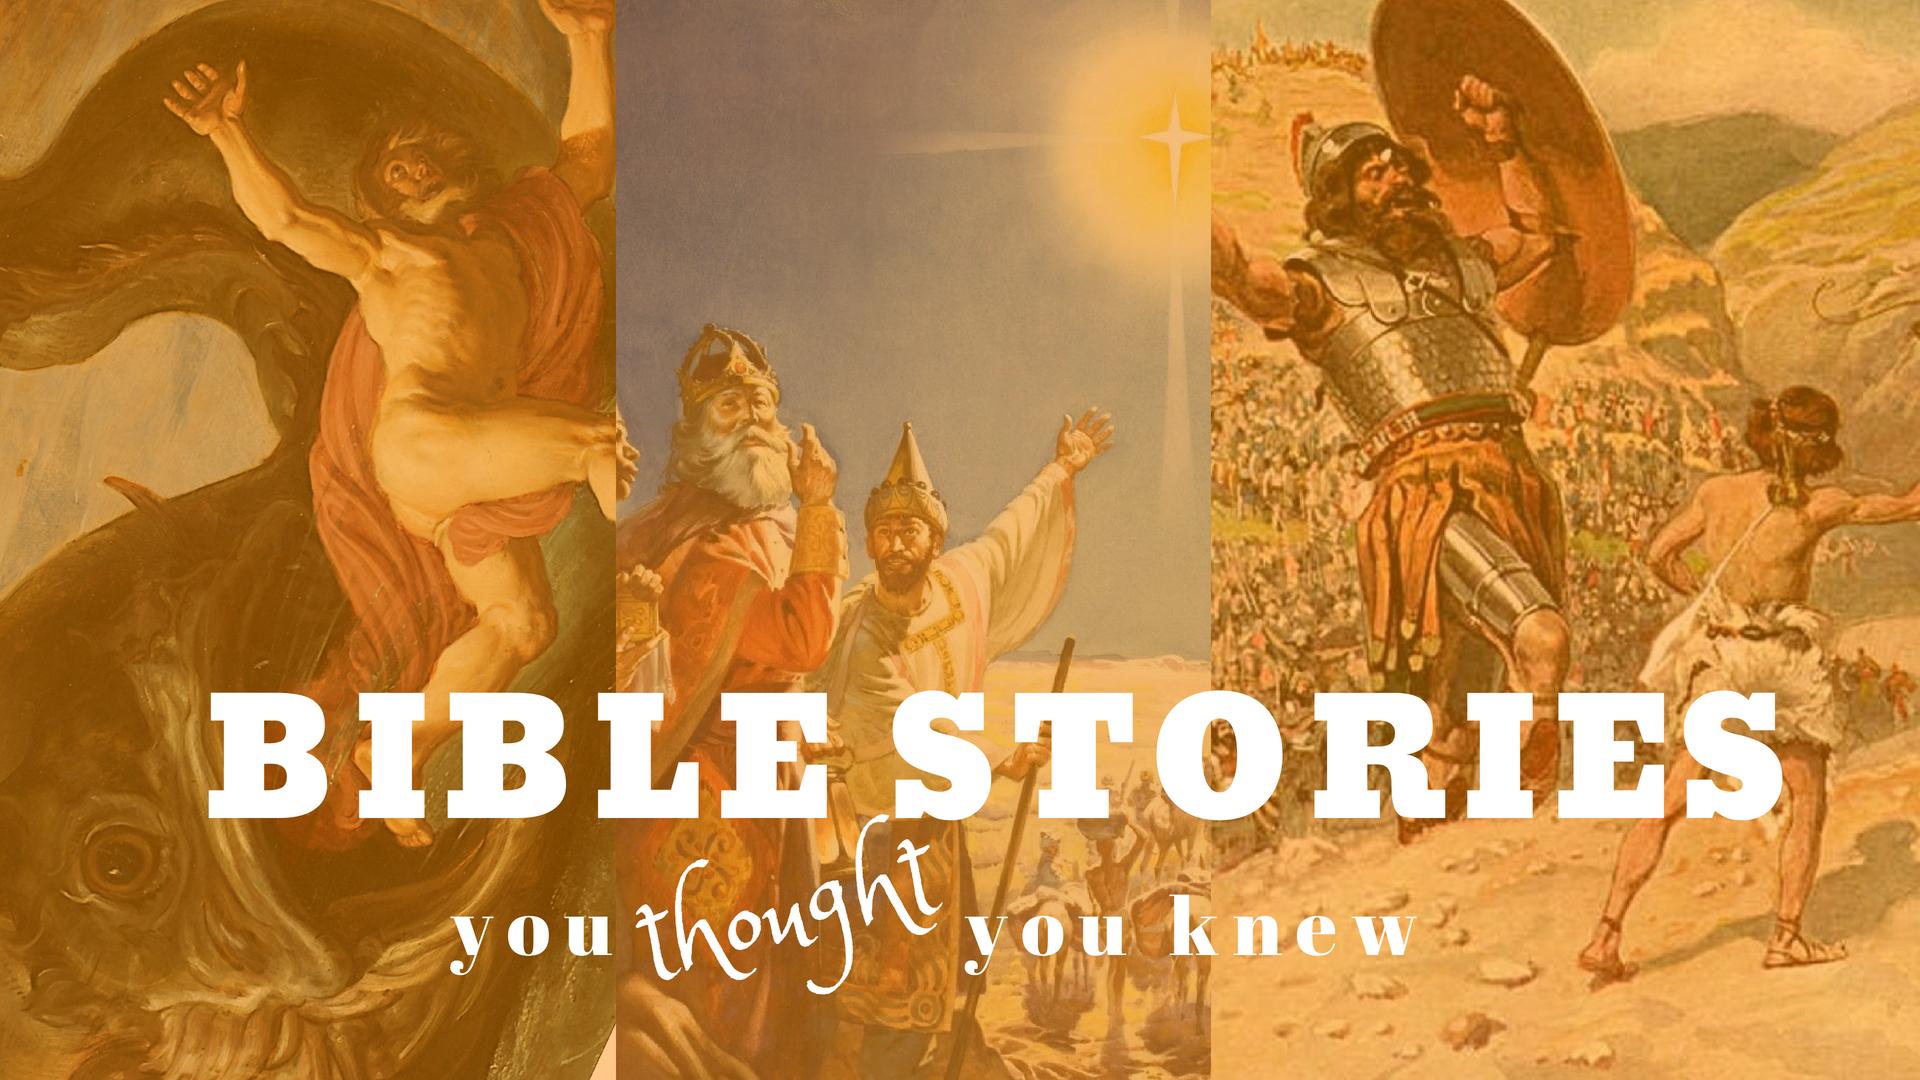 Bible Stories - Title Slide.jpg